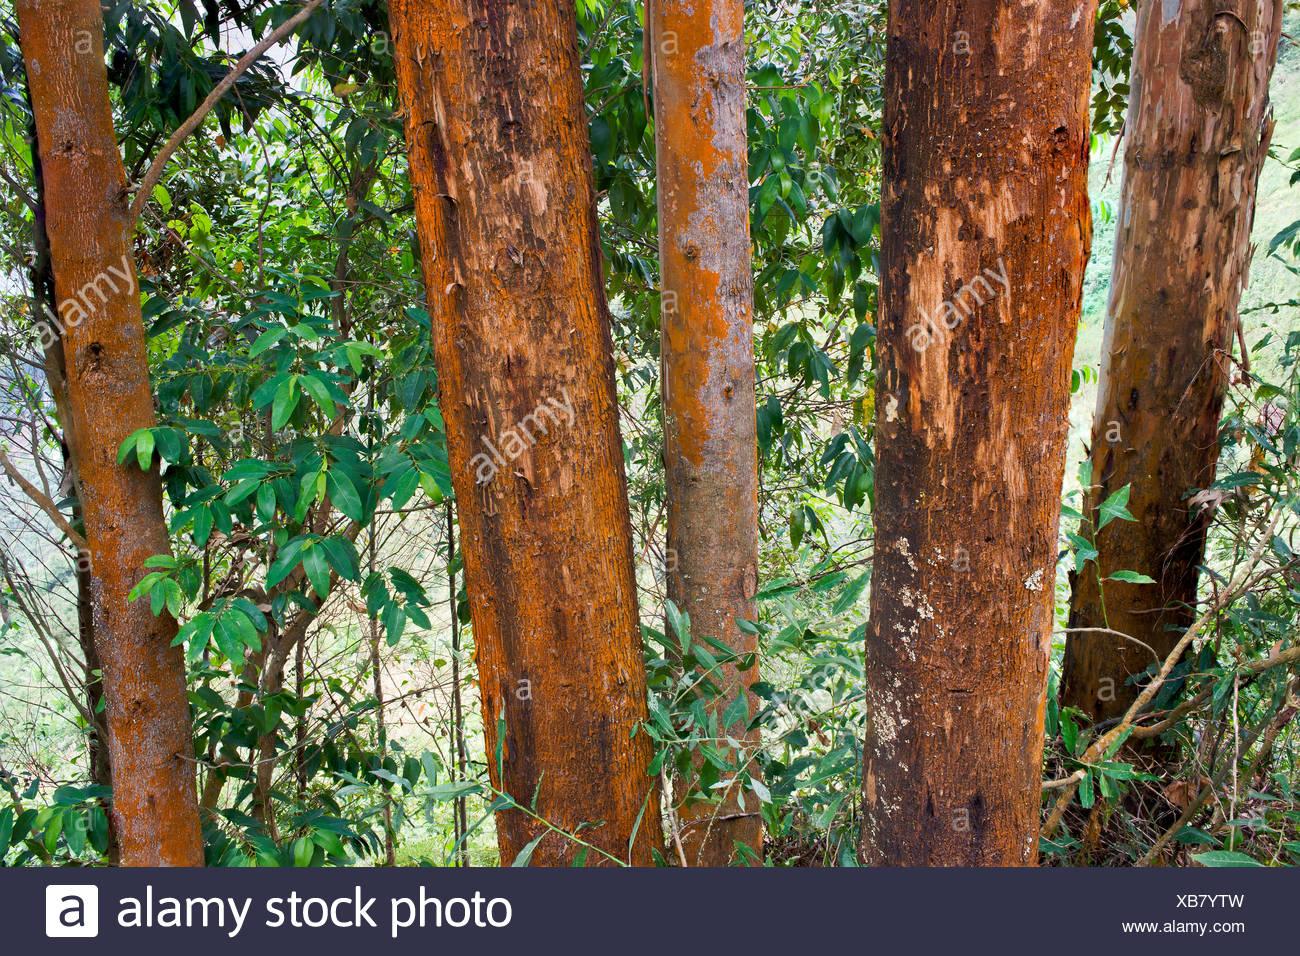 Eucalyptus Trees Africa Stock Photos & Eucalyptus Trees